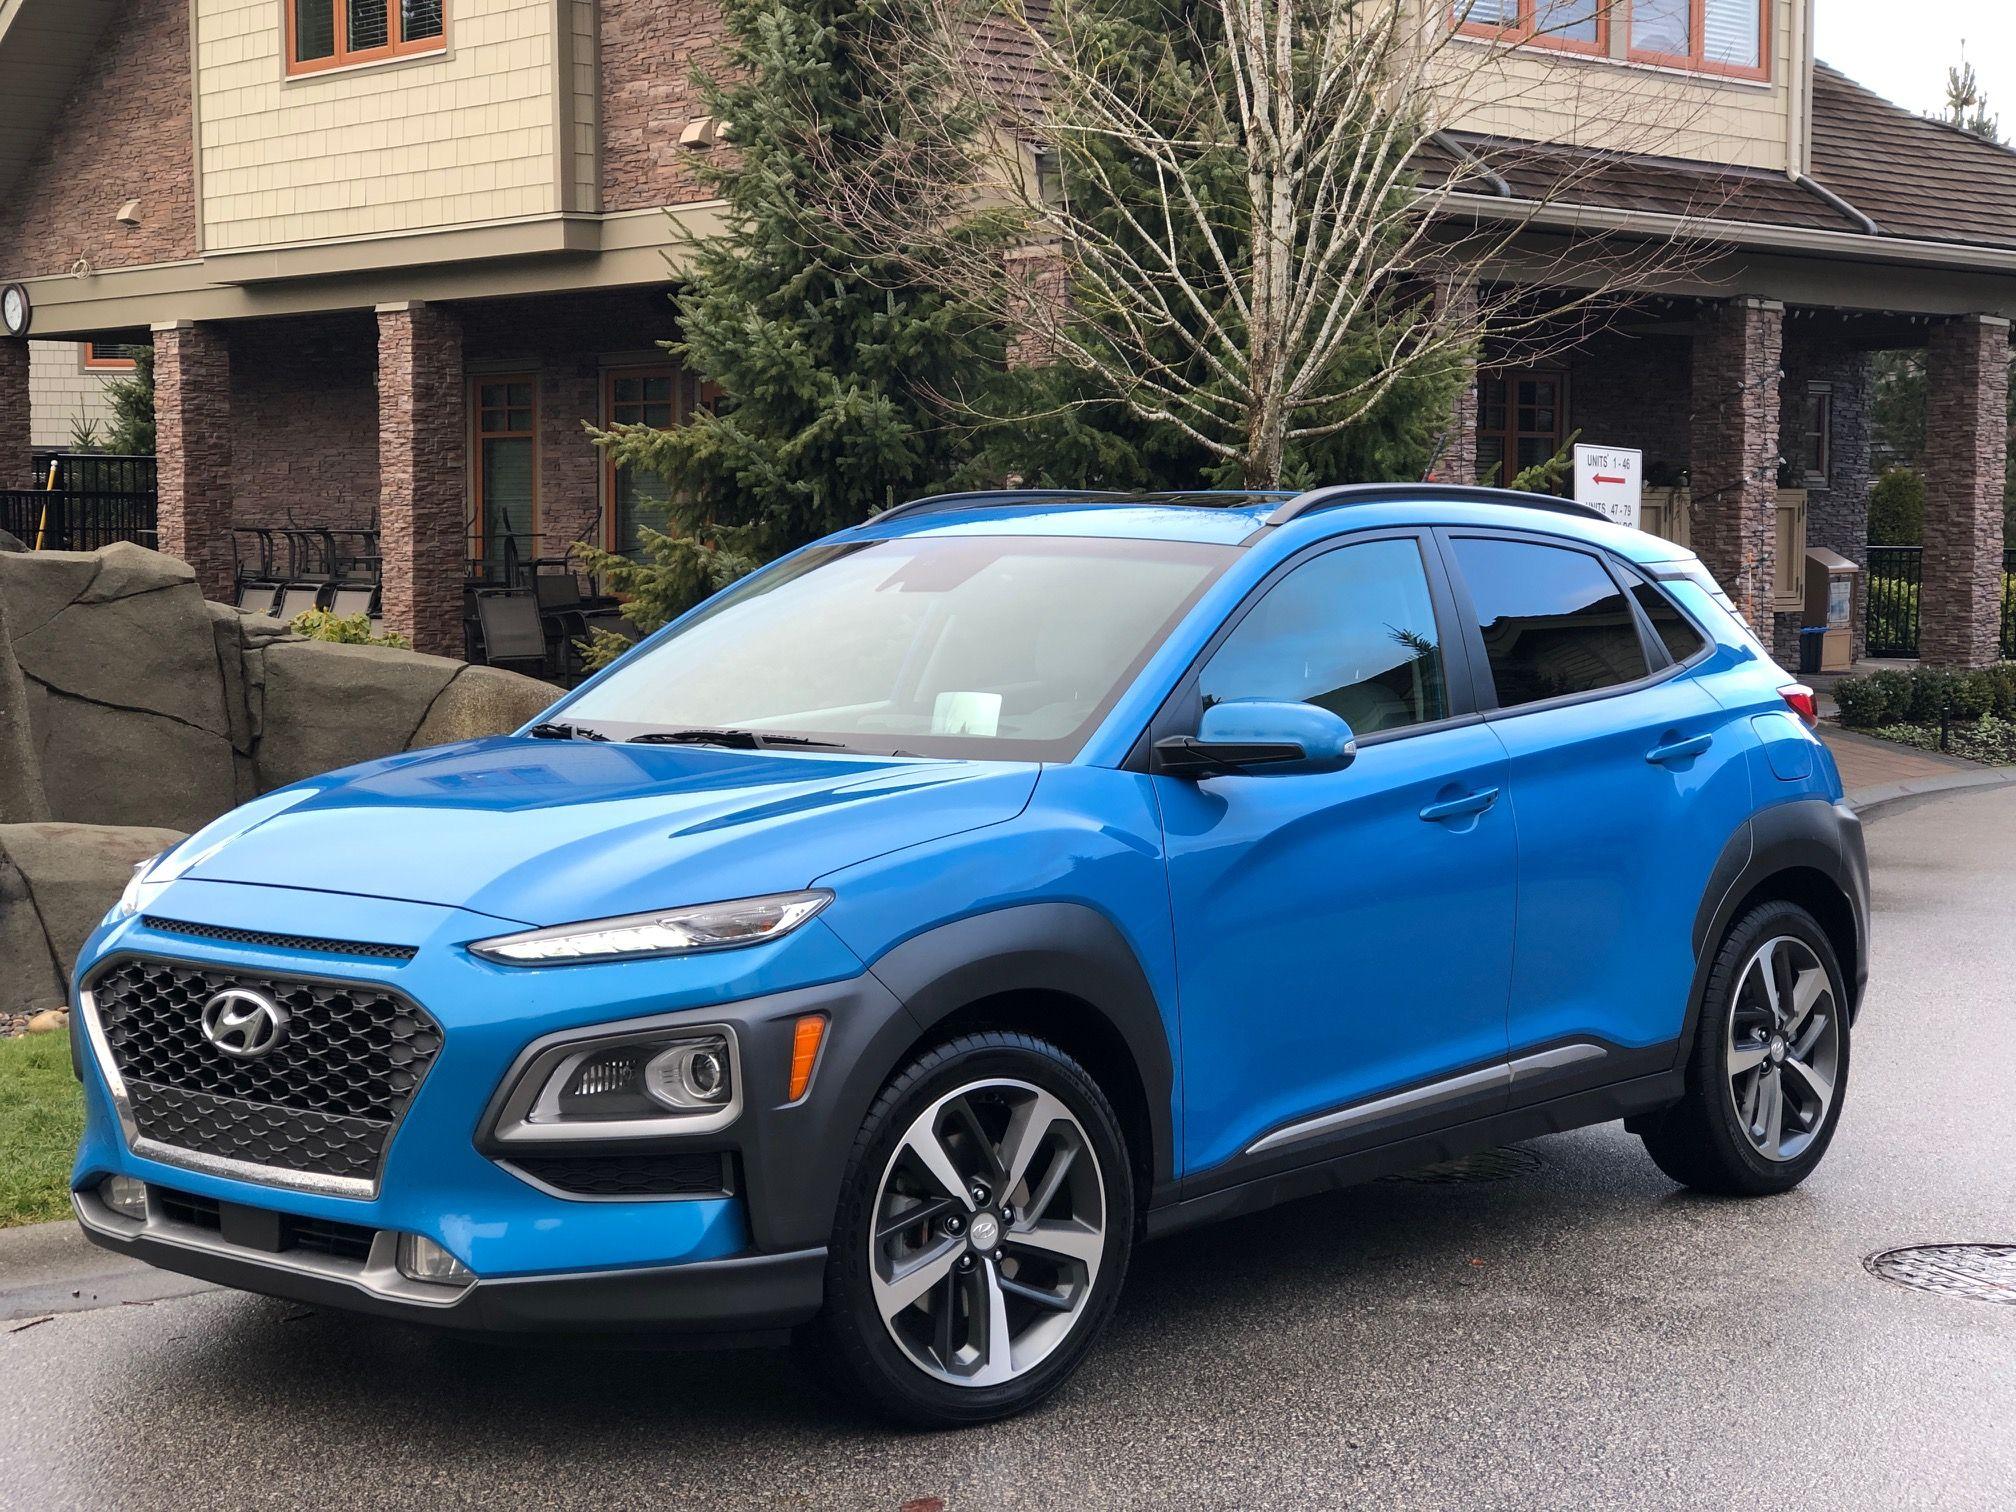 2018 Hyundai Kona Sporty Suv Fuel Economy